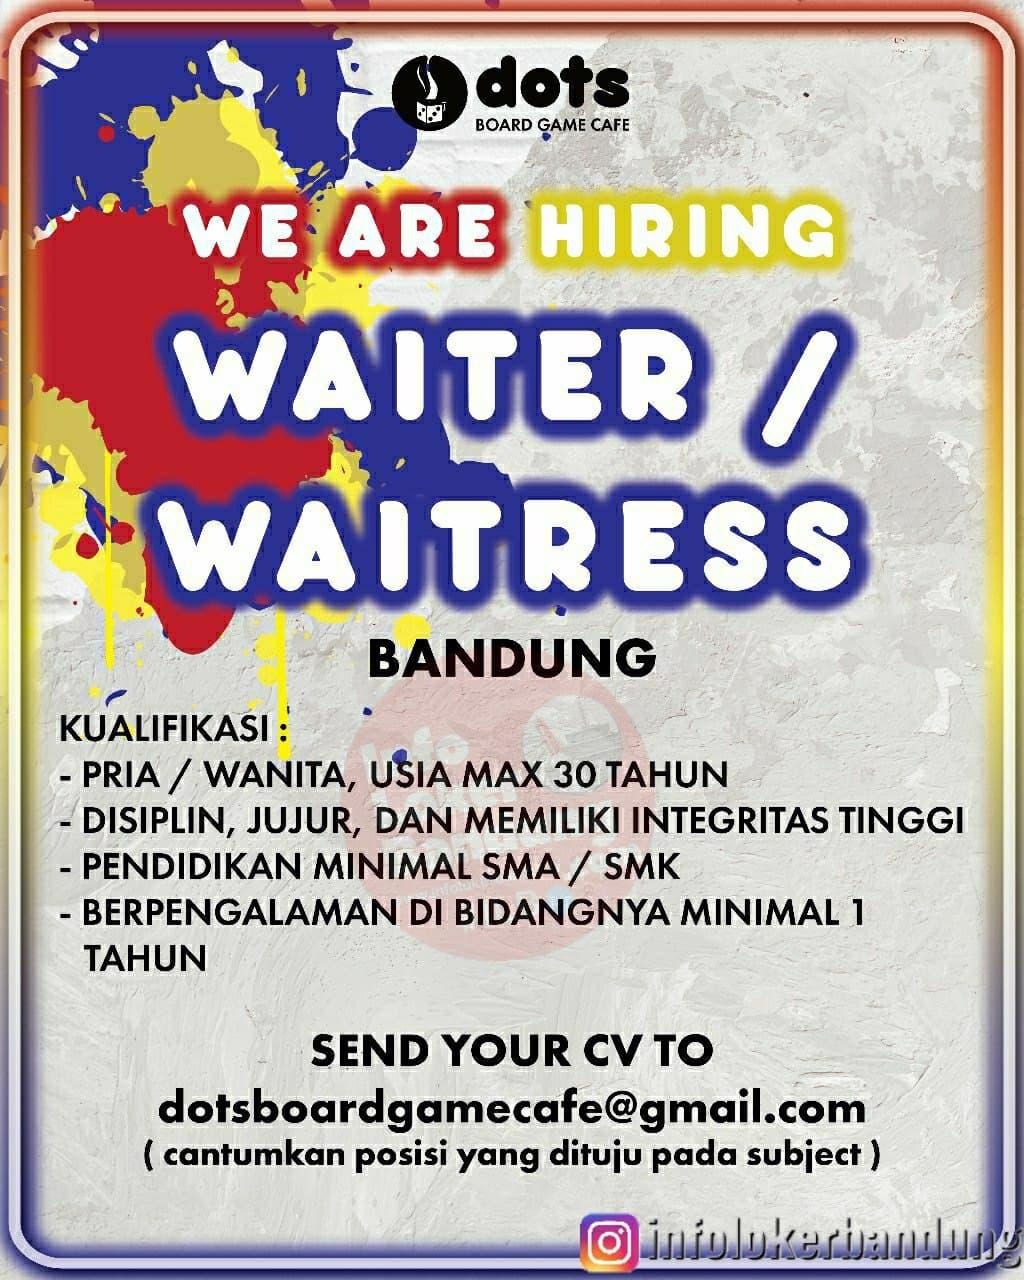 Lowongan Kerja Waiter / Waitress DOTS Board Game Cafe Bandung Januari 2021